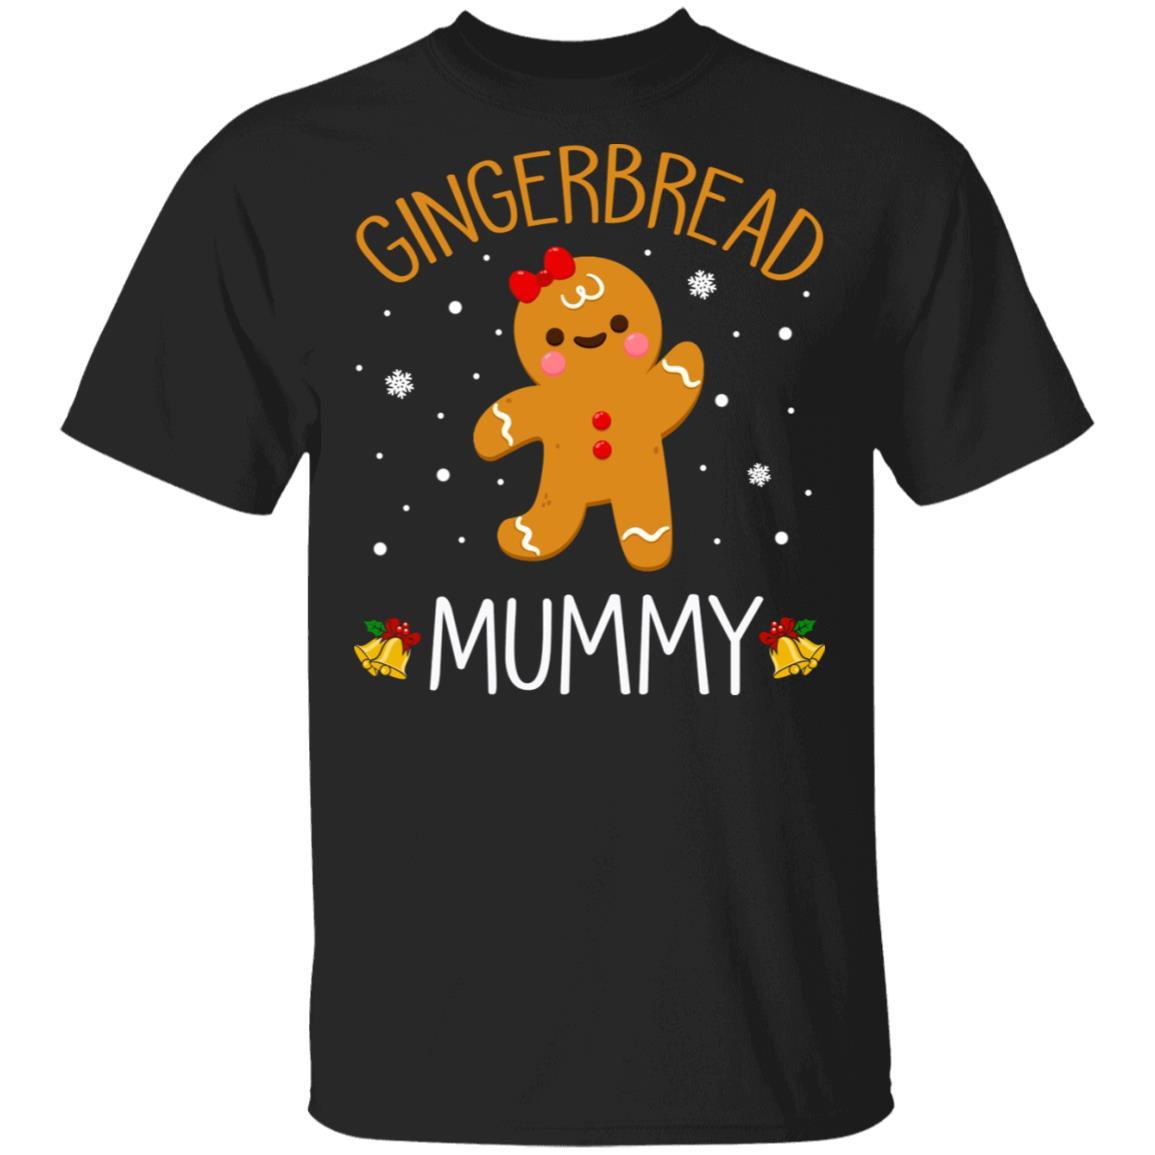 Xmas Cute Gingerbread Men Mummy Christmas Family Unisex Short Sleeve